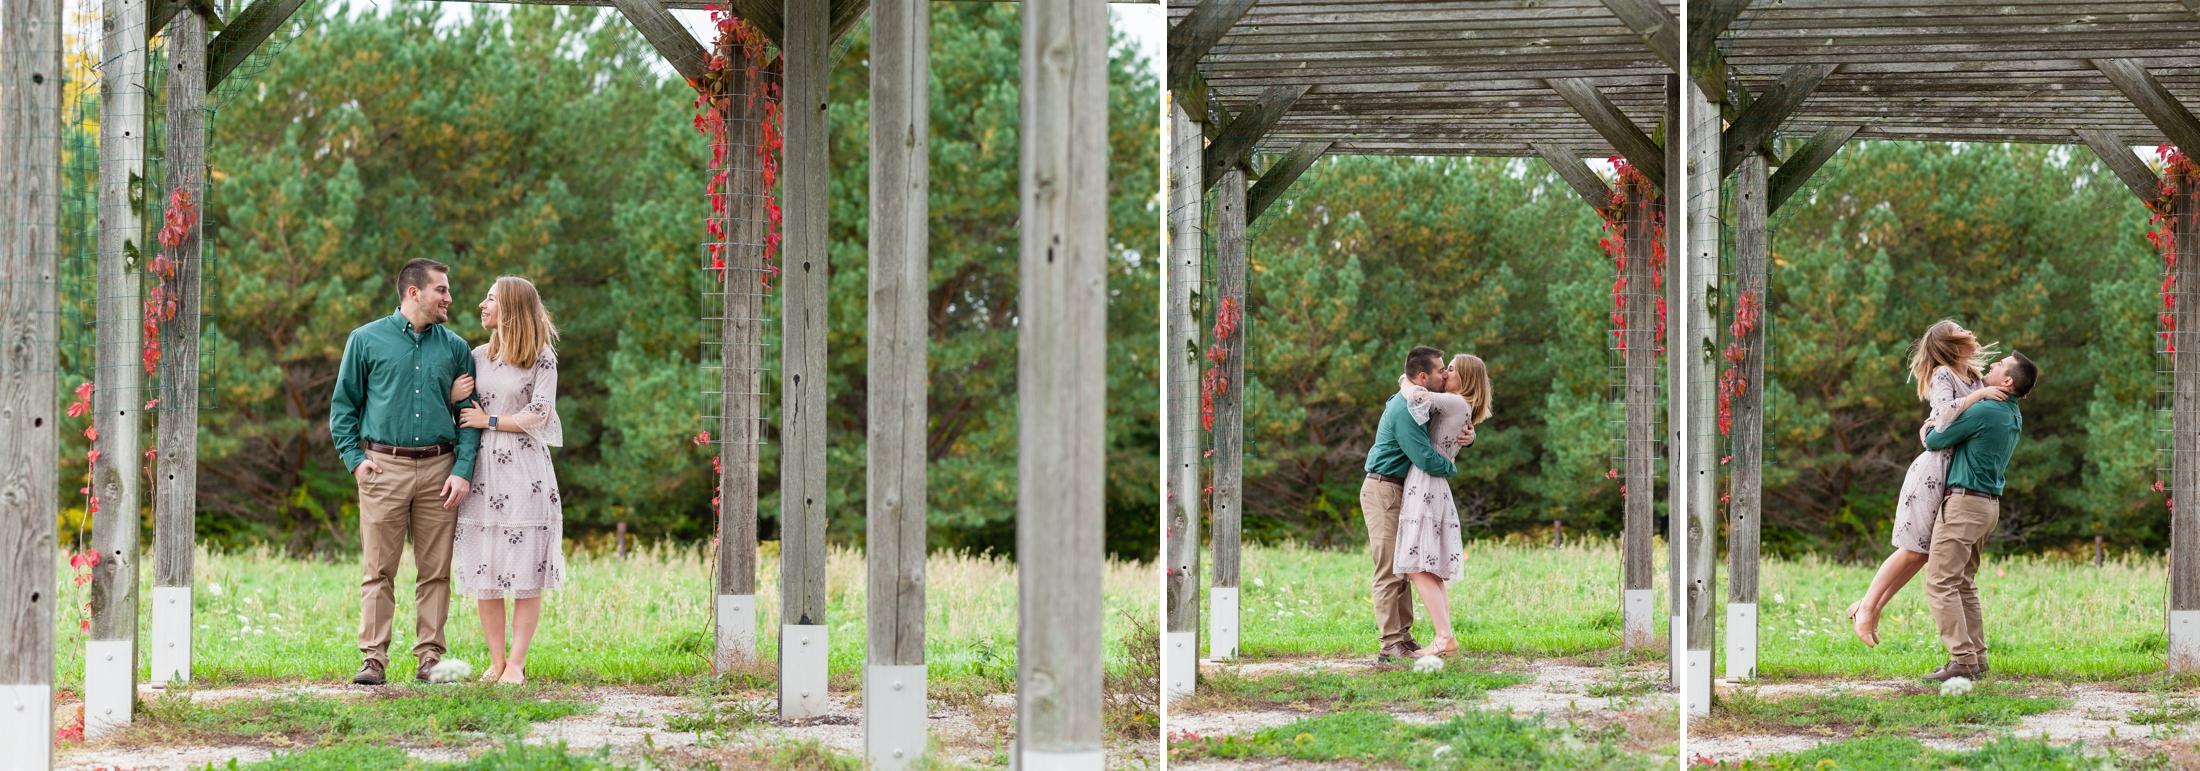 best-wisconsin-wedding-photographer-engagement-session-3.jpg